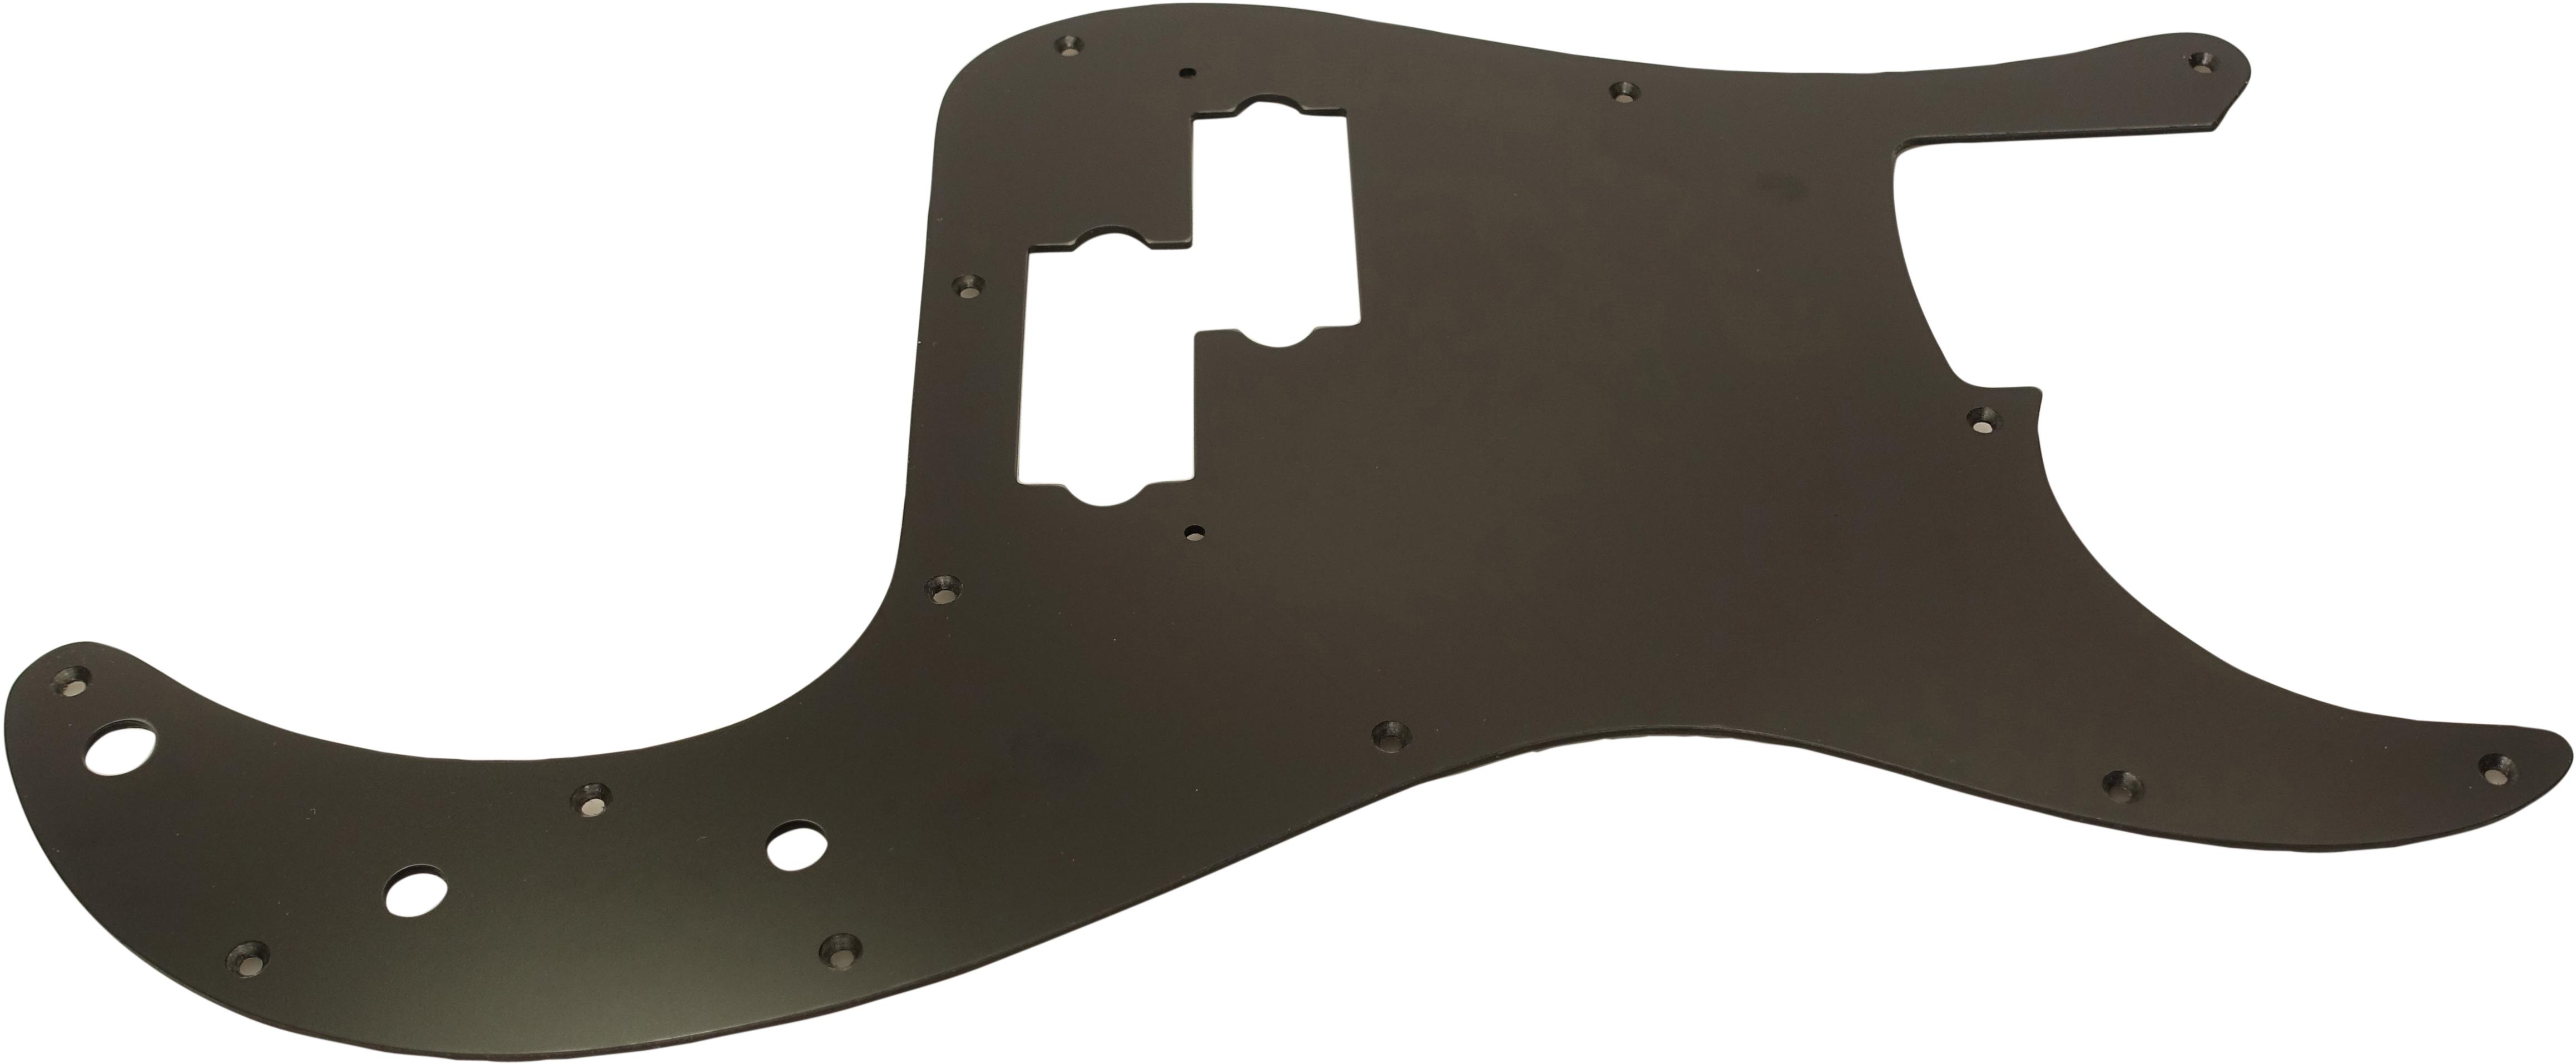 Toronzo Pickguard PB-1PLY-Black Satin